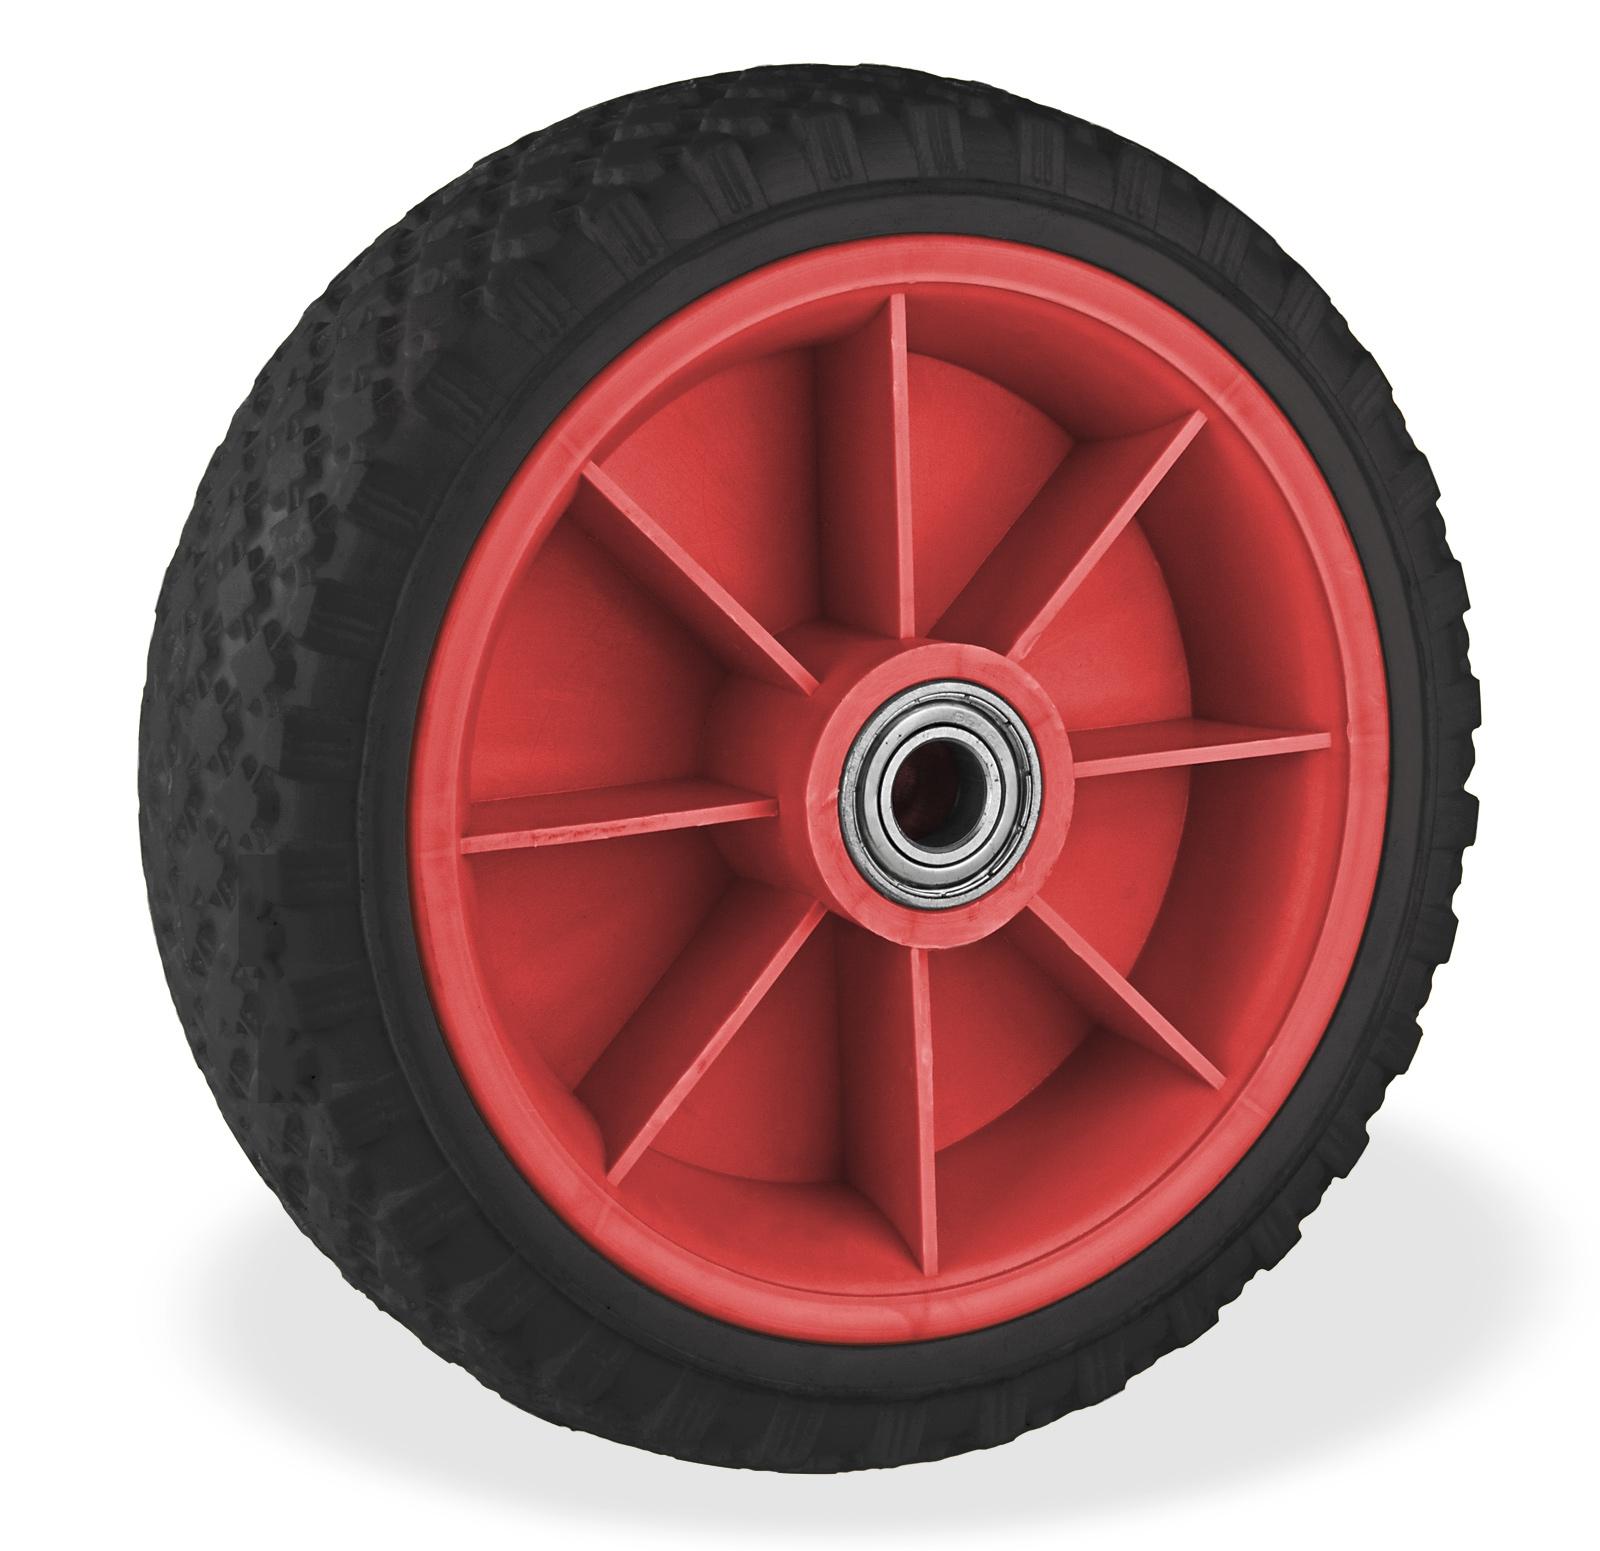 Dema 2 Stück PU Schubkarrenrad Schubkarren Reifen 65x220 unplattbar pannensicher 21350x2